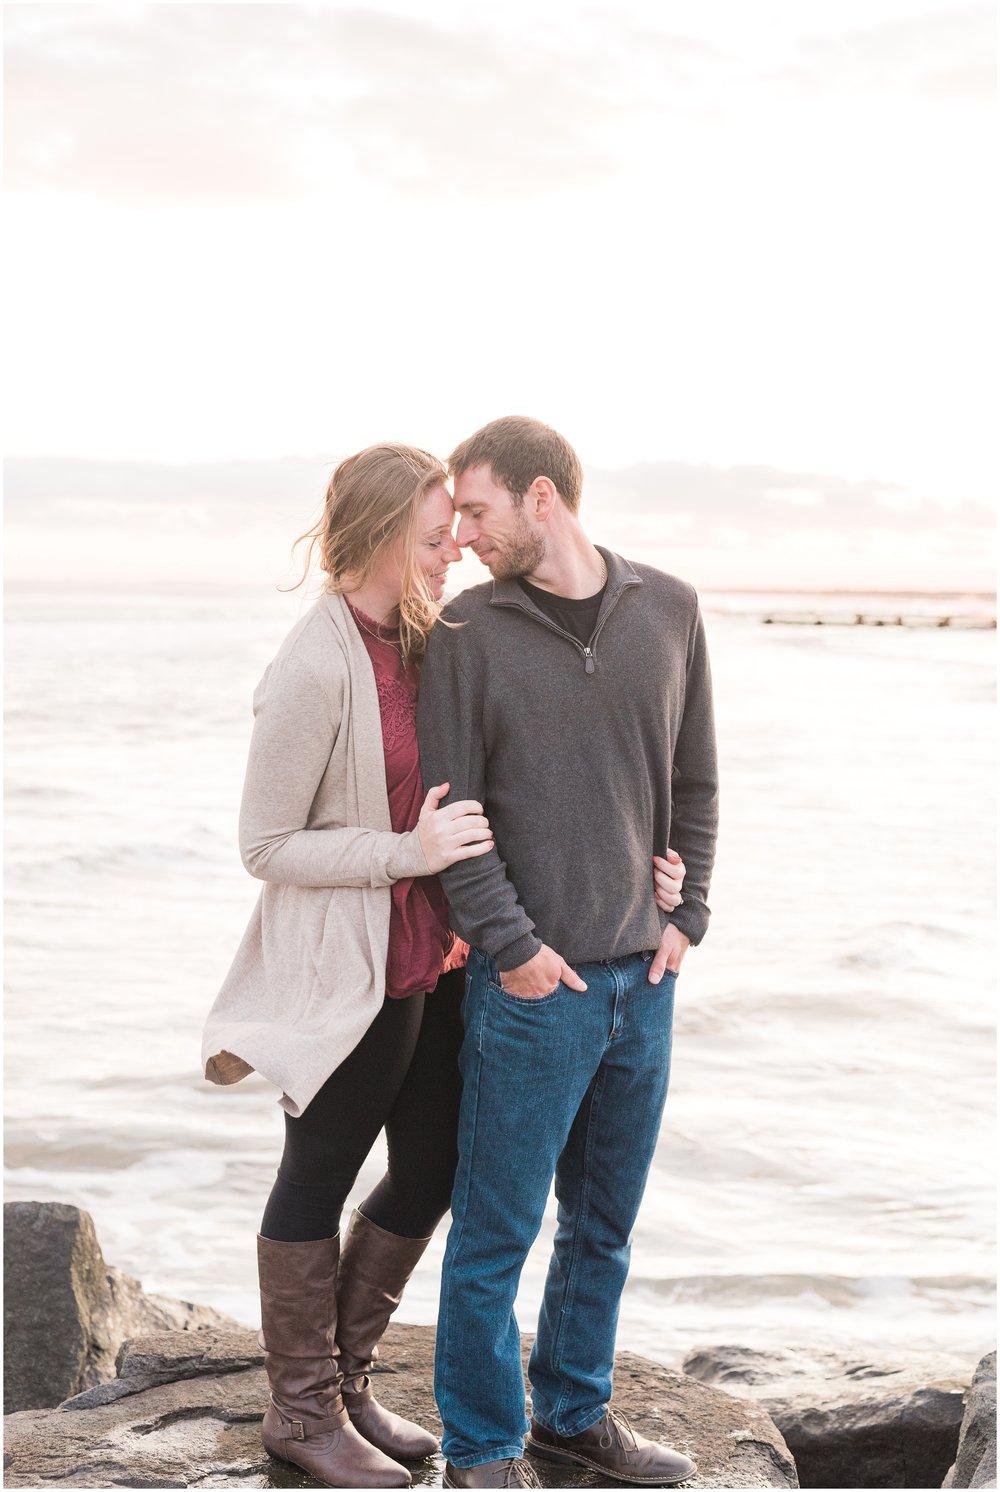 NJ-Ocean-City-Beach-Boardwalk-Engagement-Session-Photo_0080.jpg